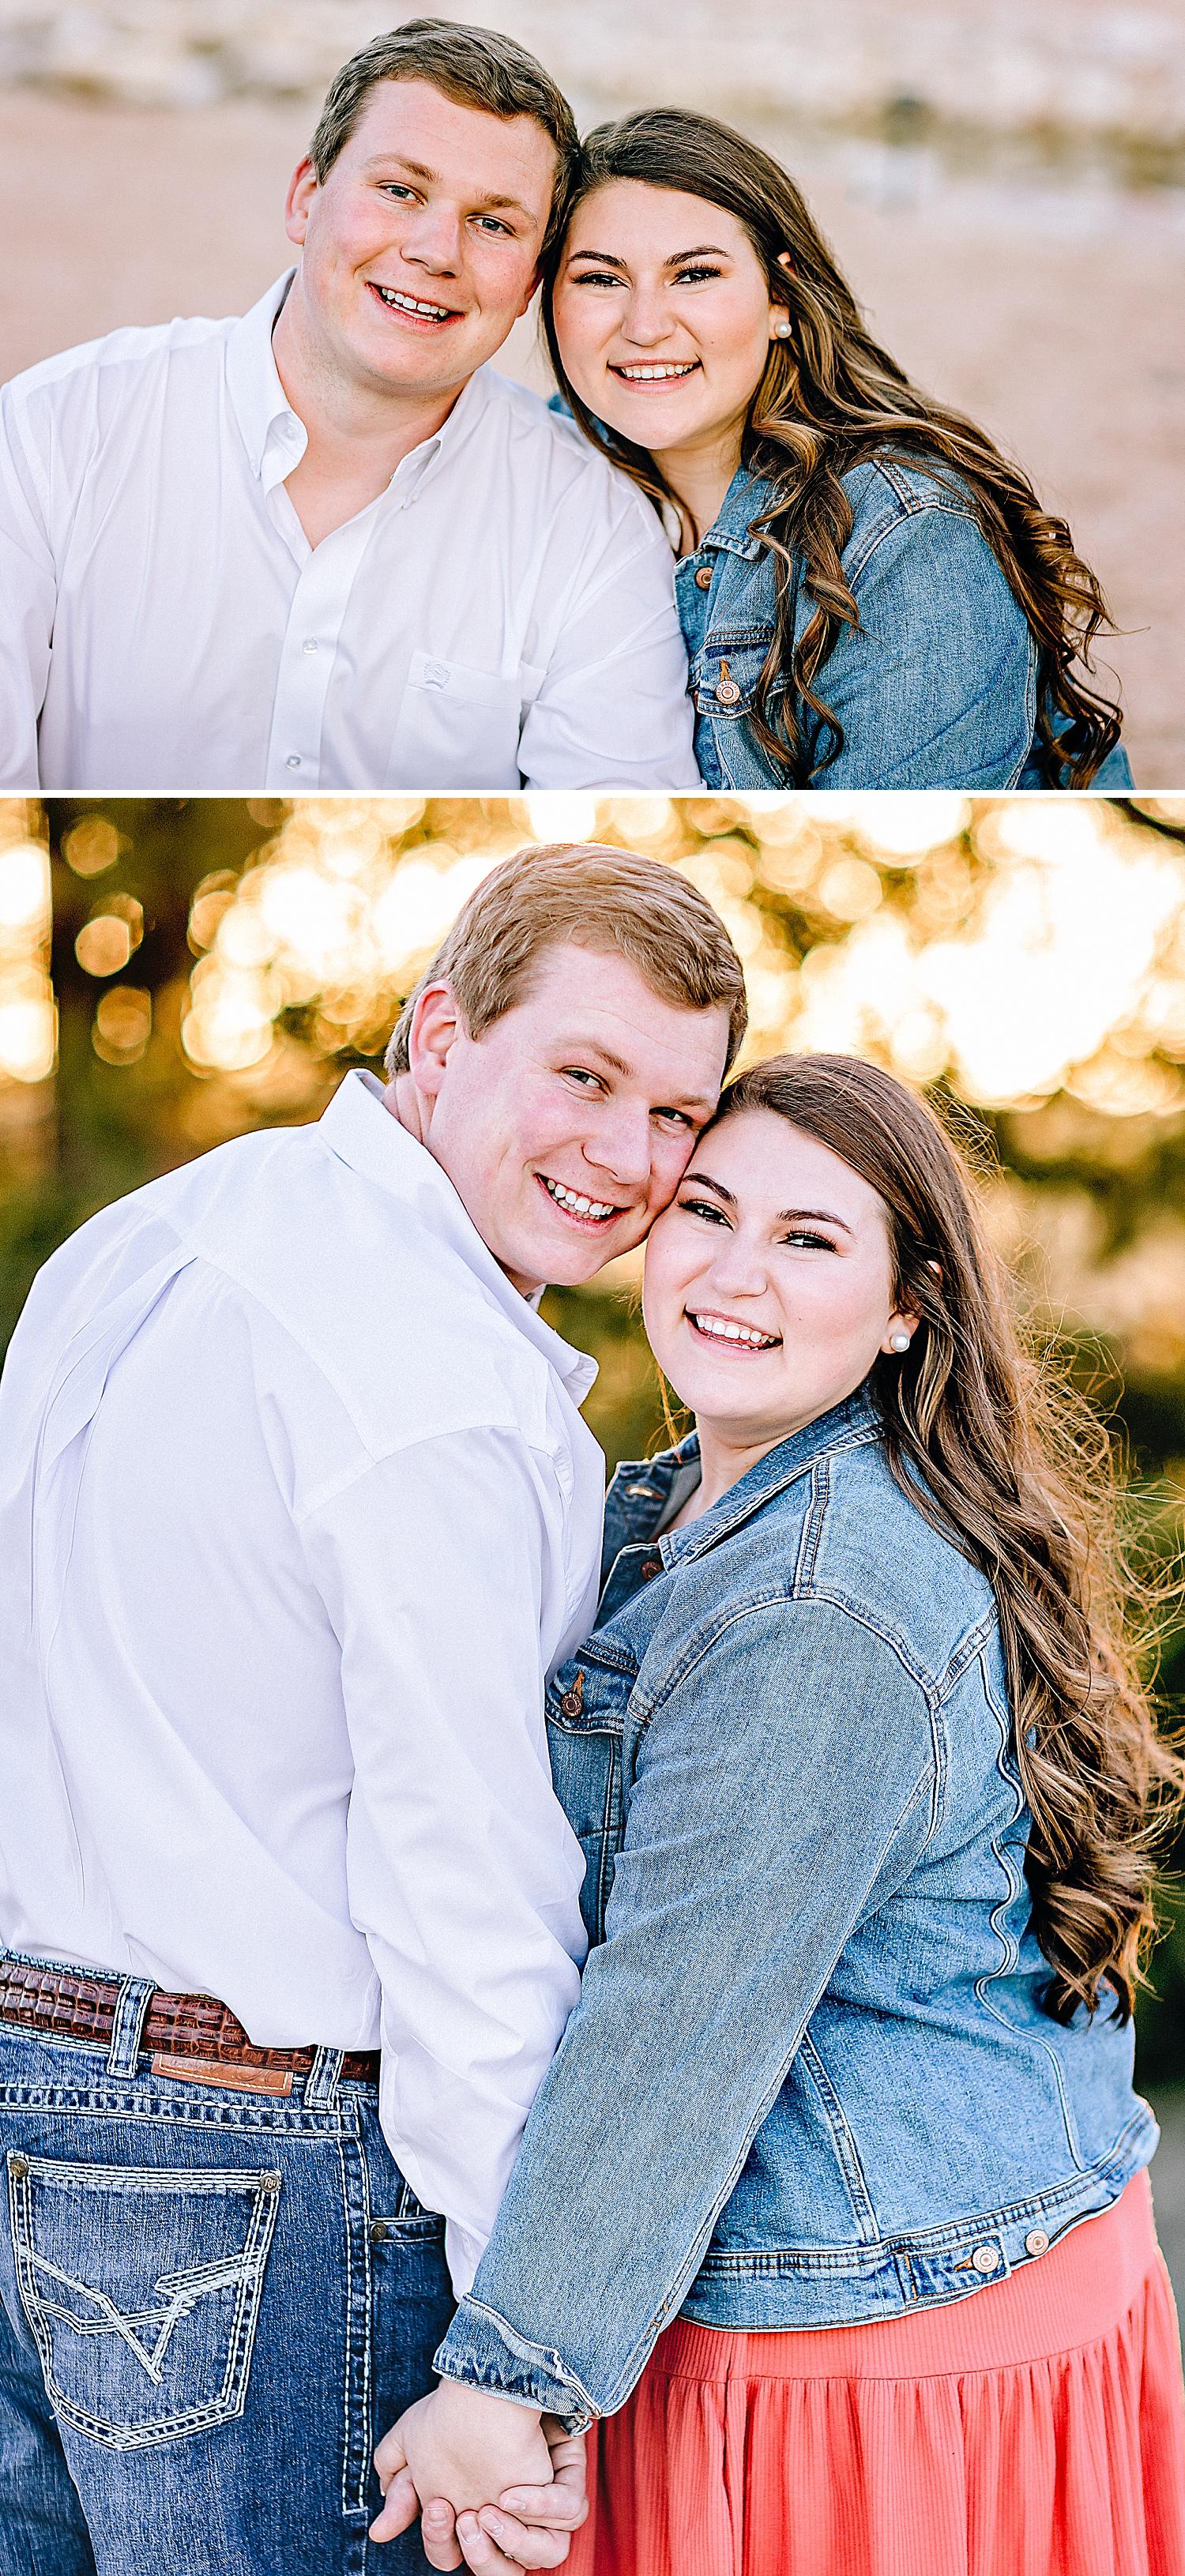 Engagement-photo-session-Western-Sky-wedding-venue-bulverde-texas-carly-barton-photography_0015.jpg